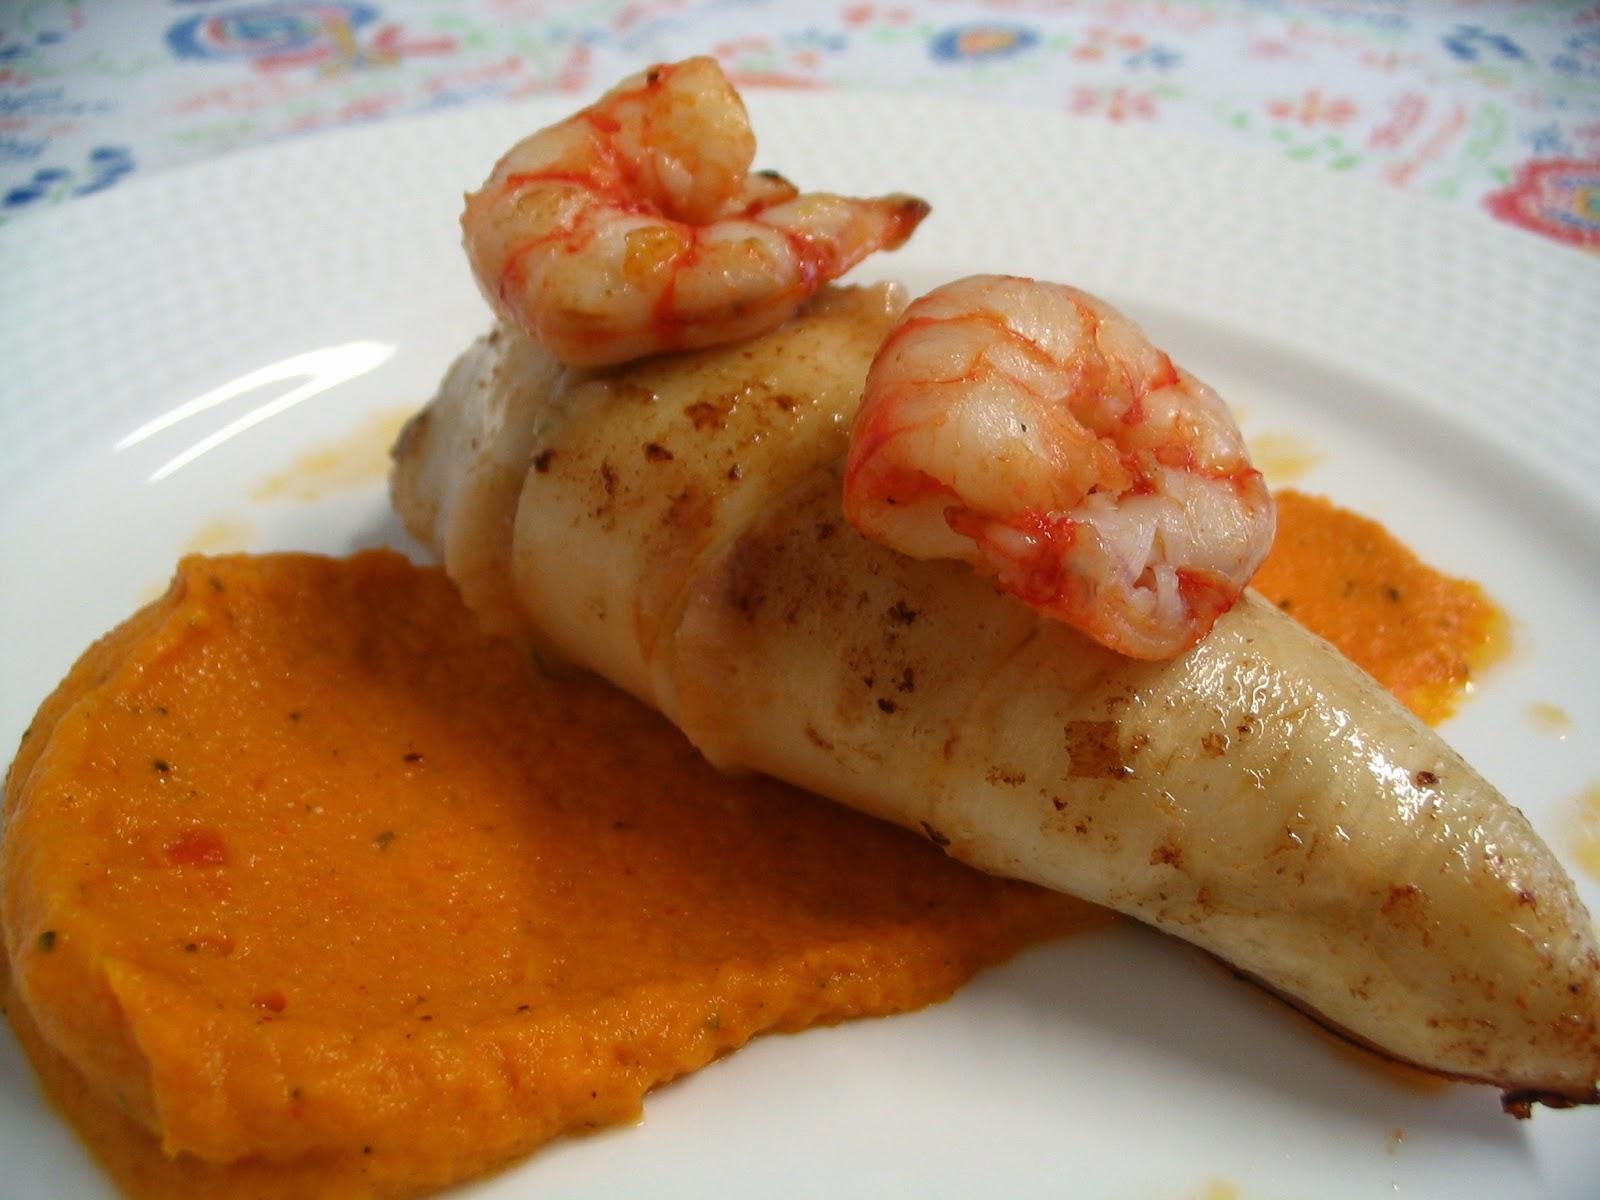 La cuchara curiosa calamares rellenos de gambas con salsa - Salsa para calamares rellenos ...